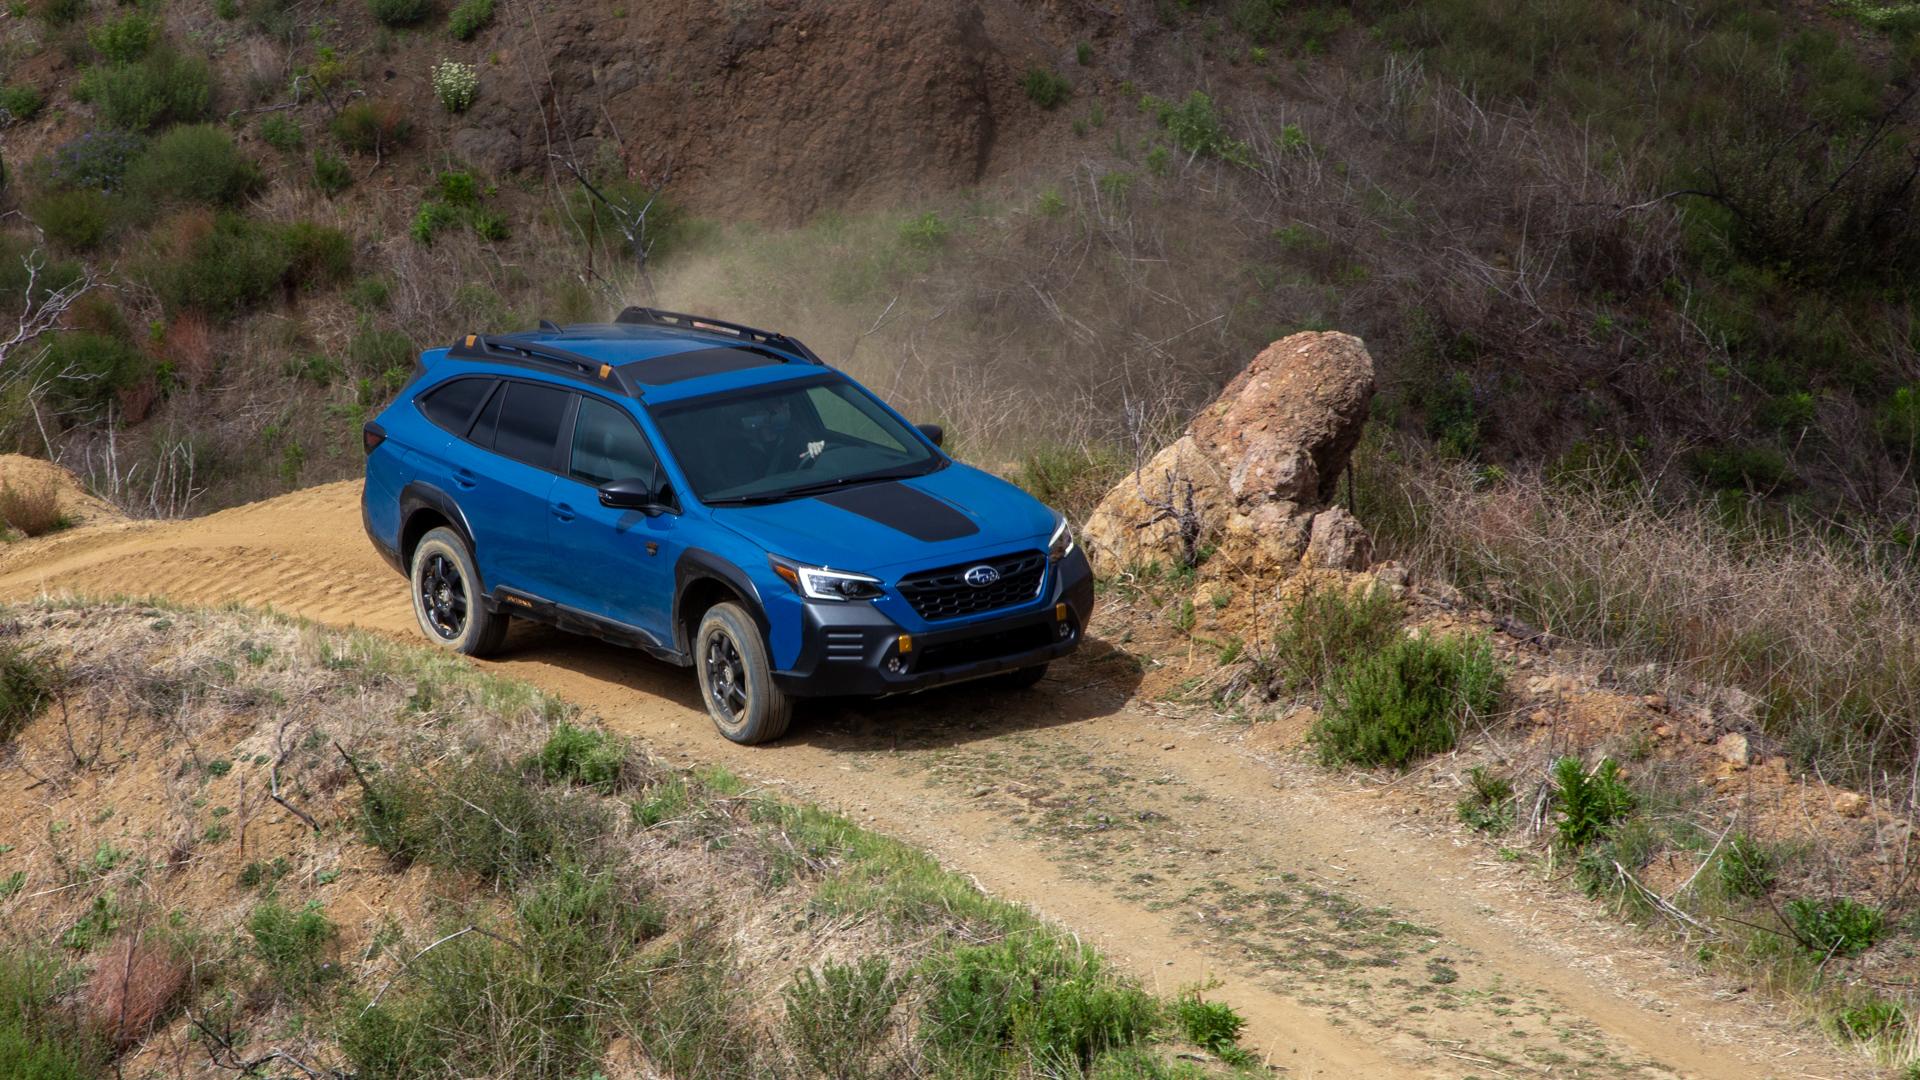 2022 Subaru Outback Wilderness Review